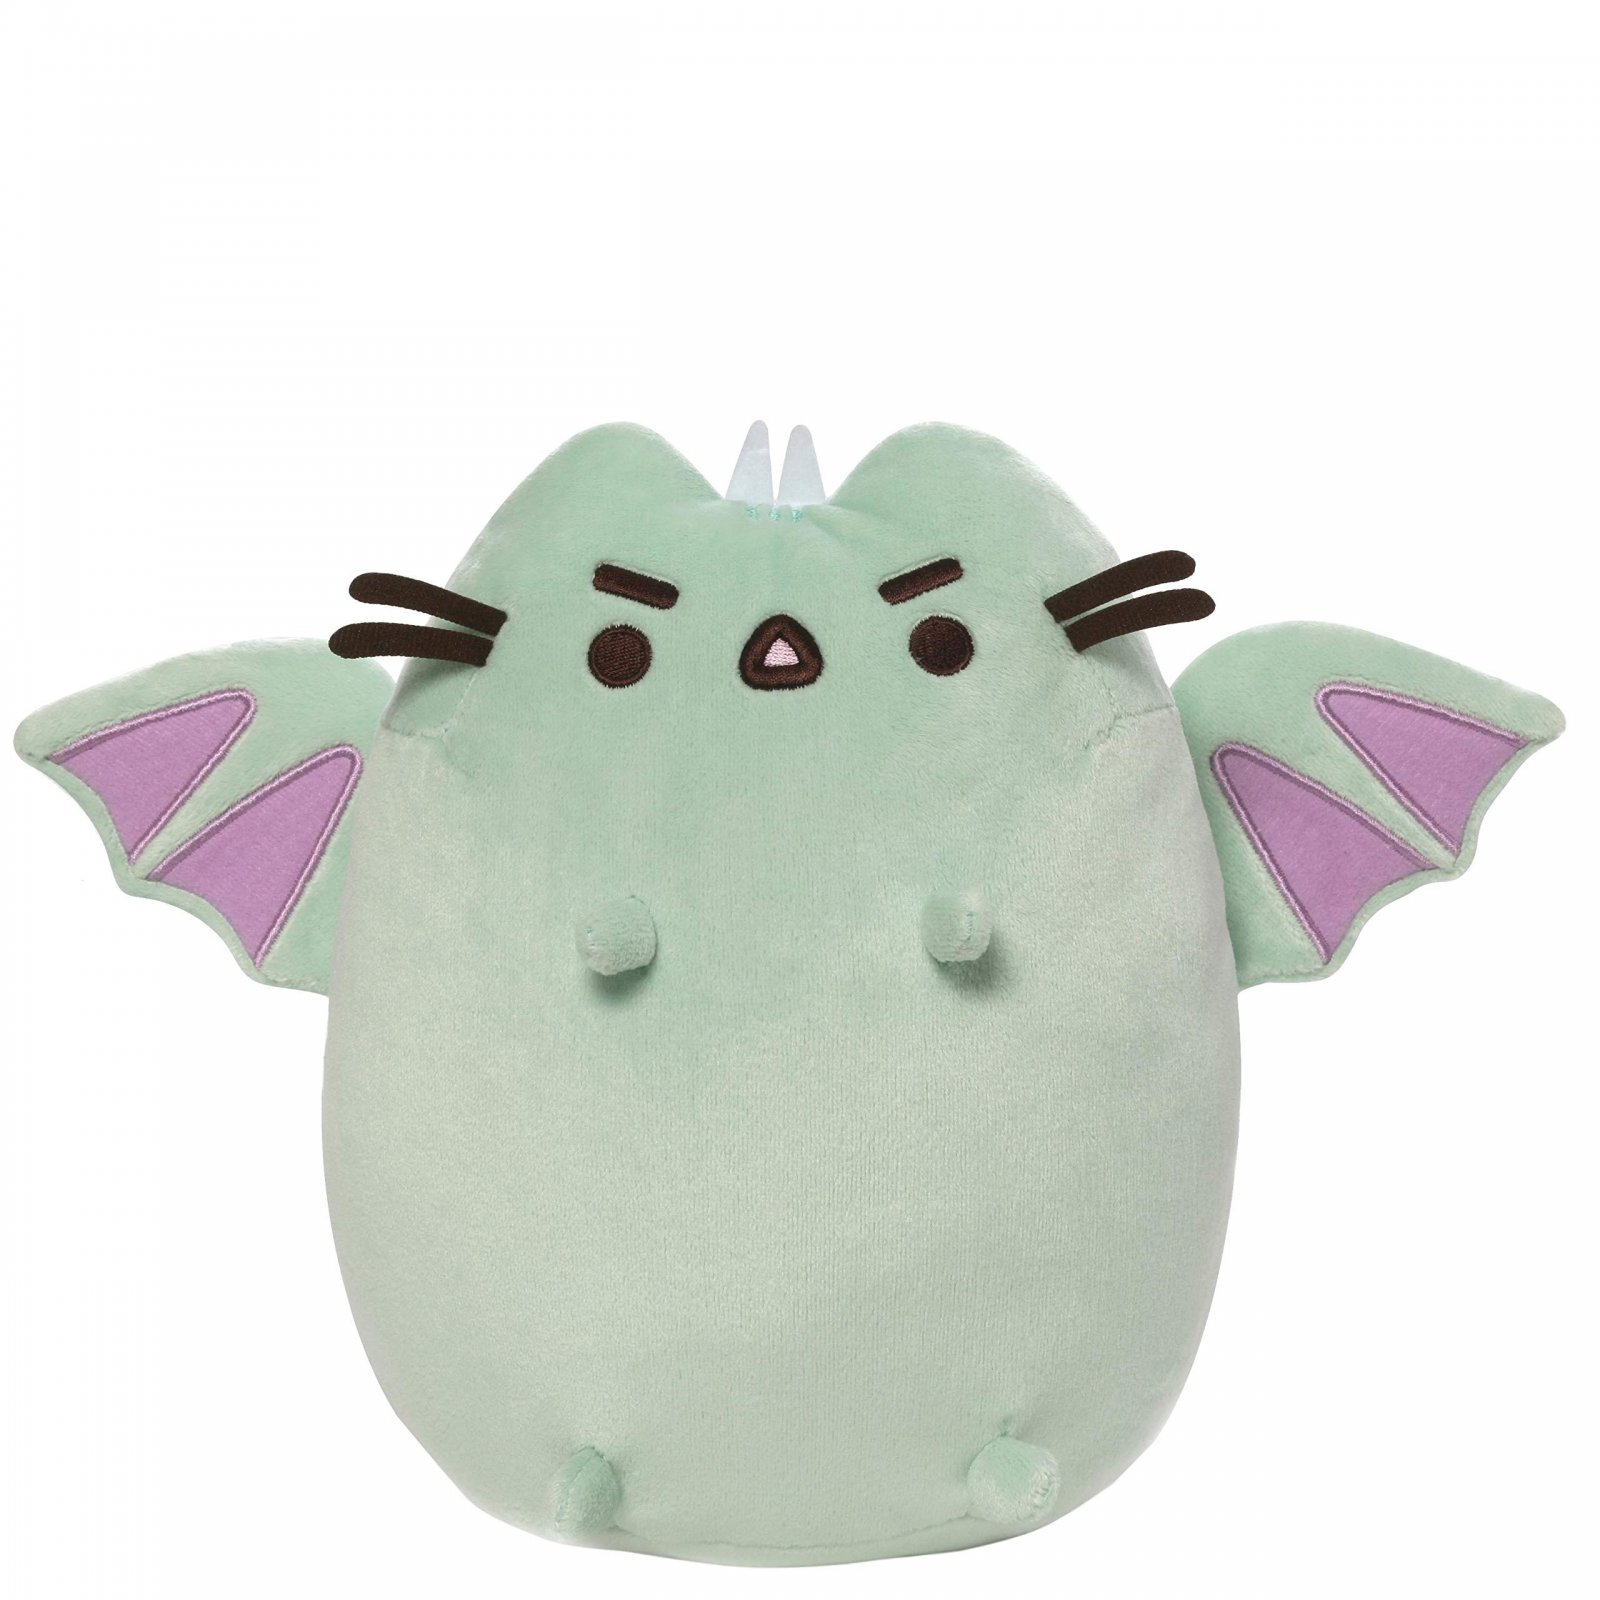 GUND Pusheen Dragonsheen Plush Stuffed Dragon, 9